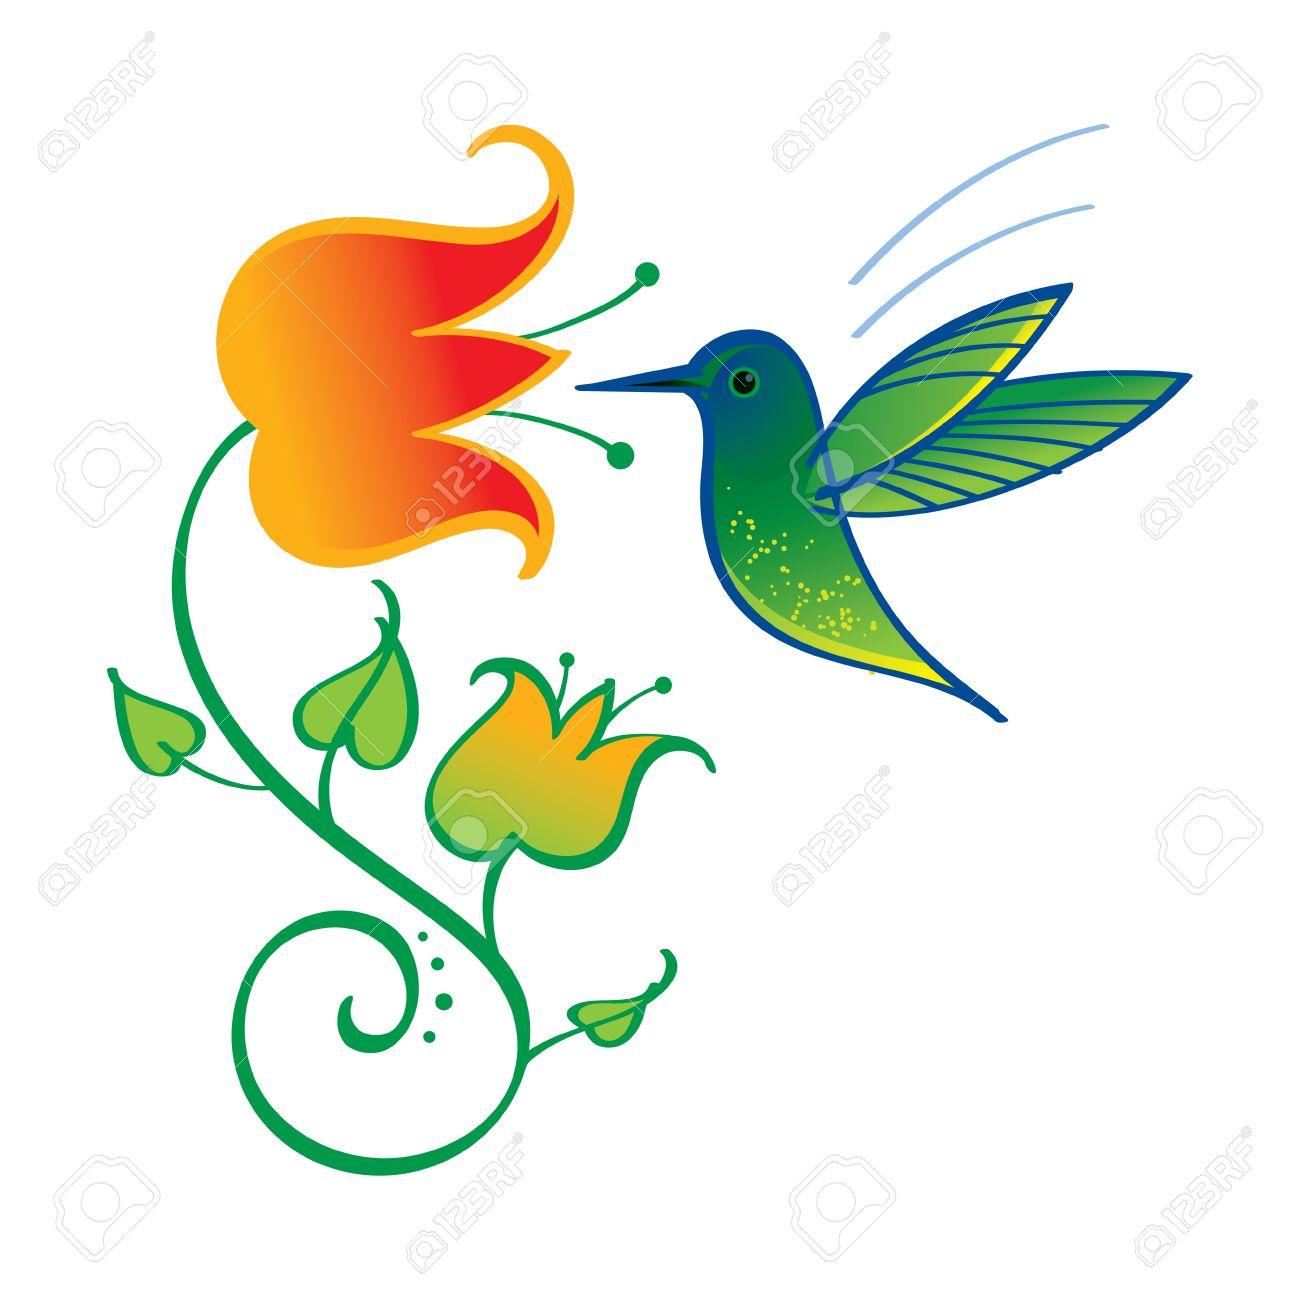 Colibri Little Exotic Bird Nature Flower Nectar Royalty Free.